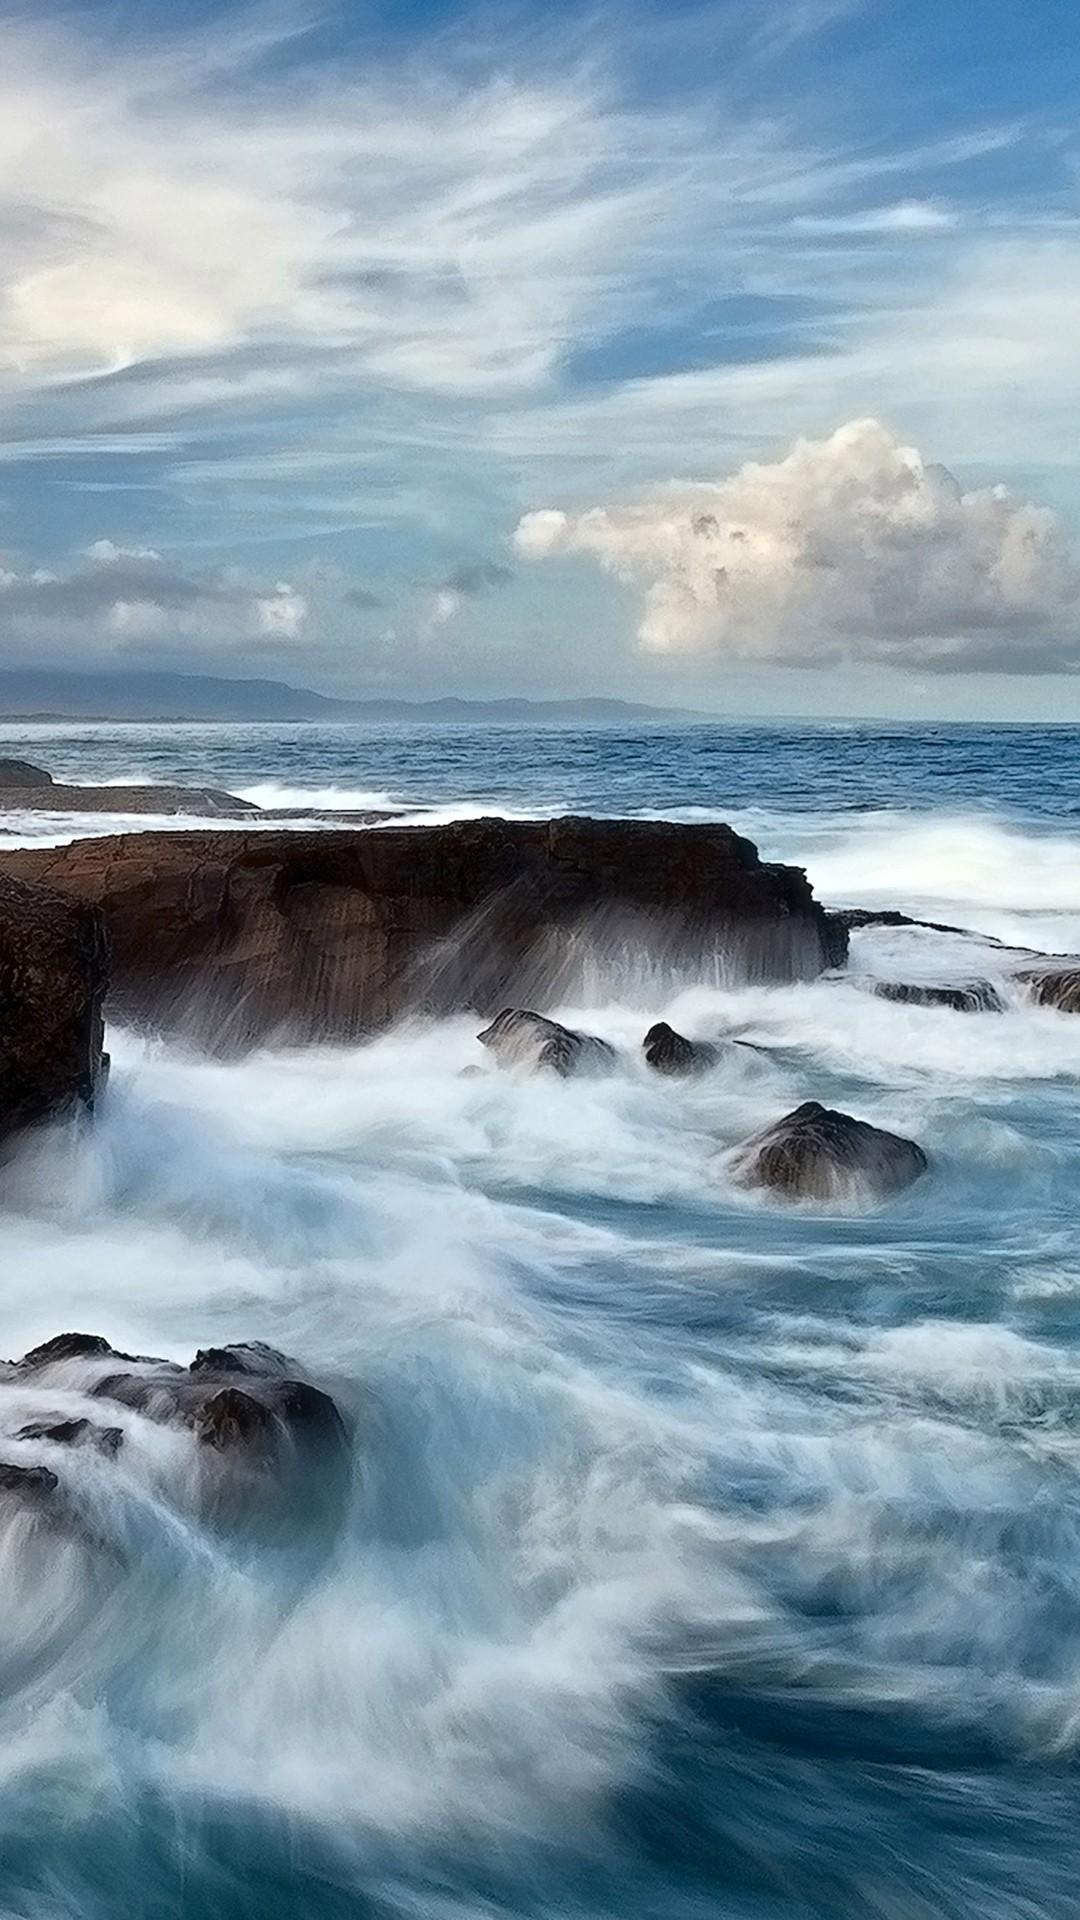 Ocean Wallpapers And Screensavers 66 Images